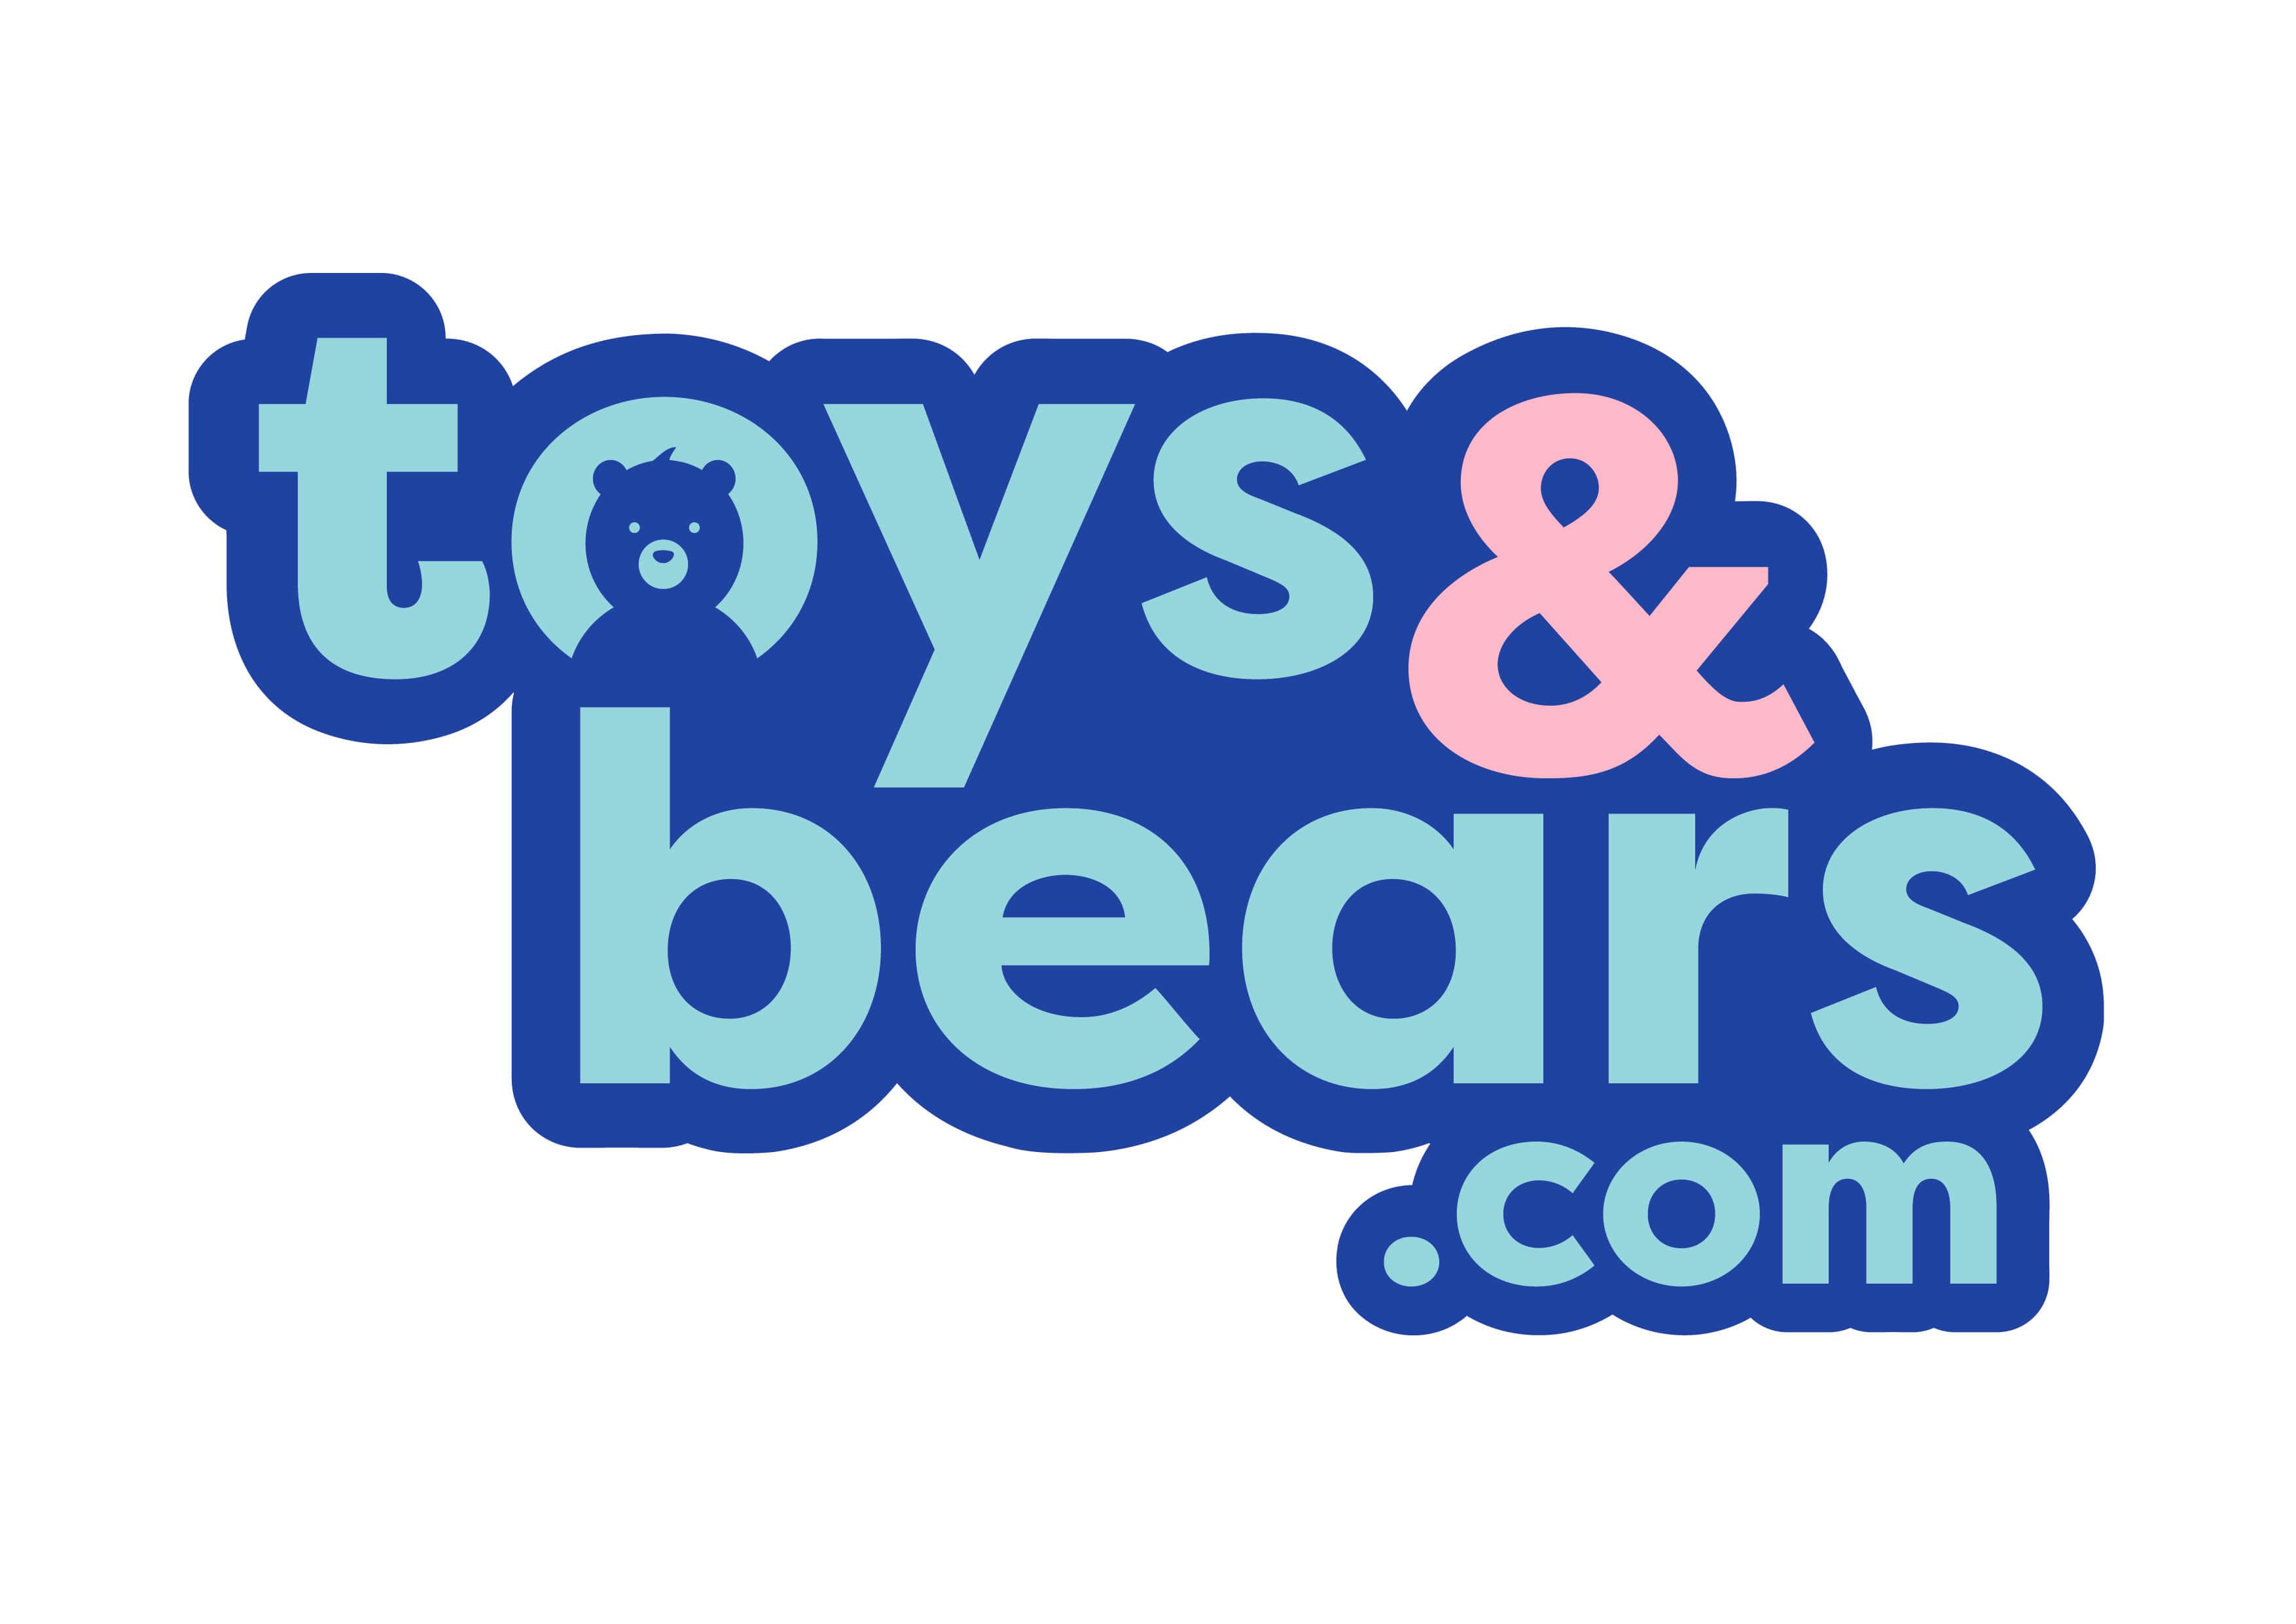 toysandbears.com's logo